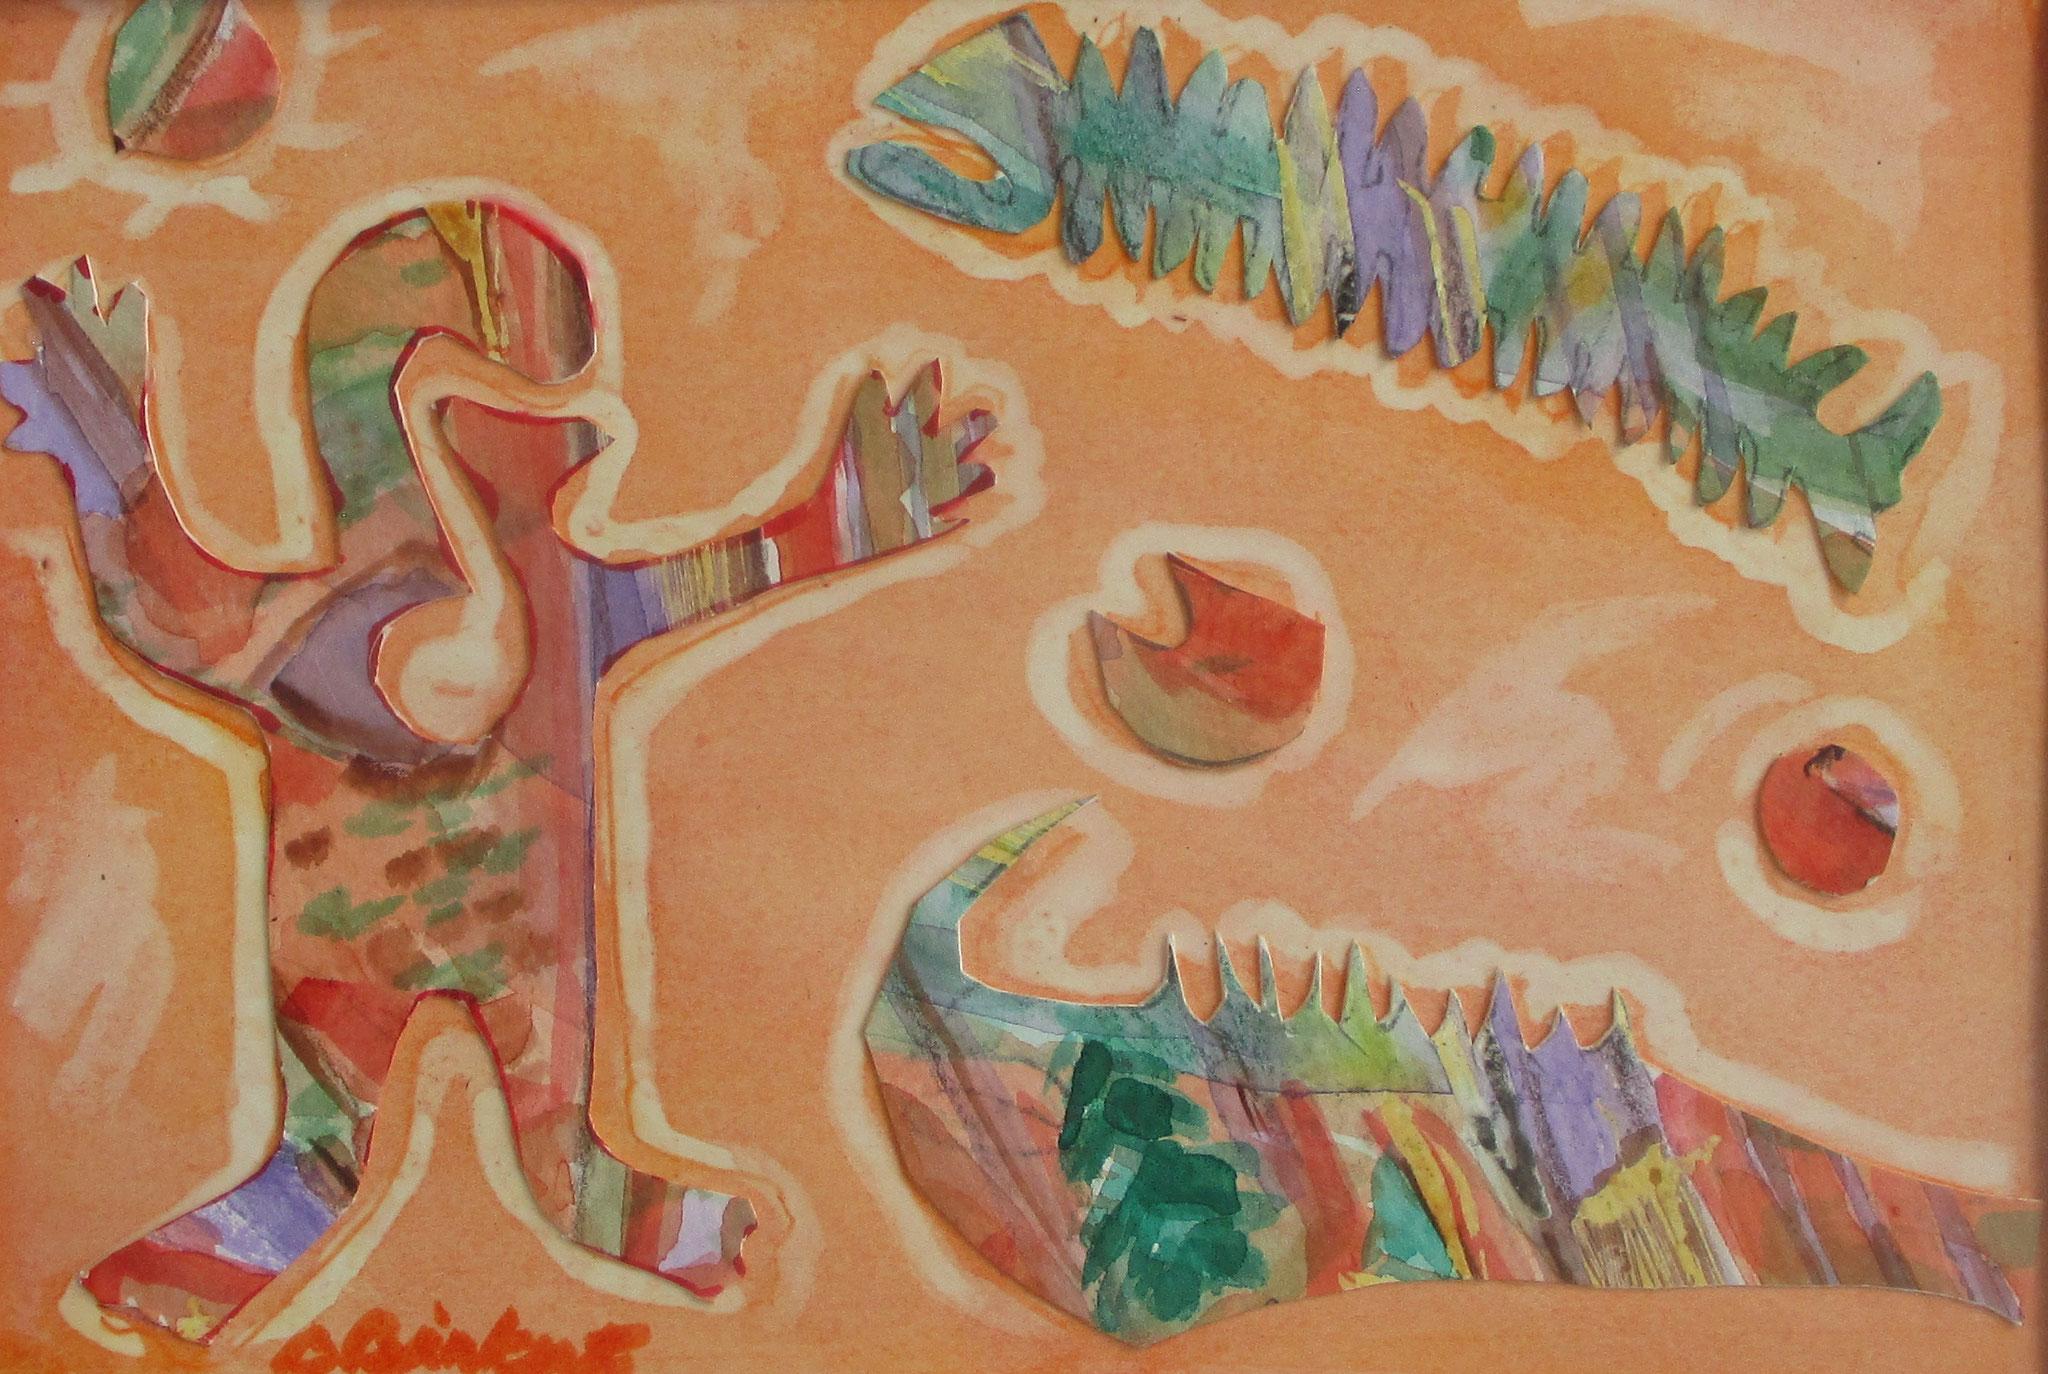 Trickster, watercolor, 11 x 14